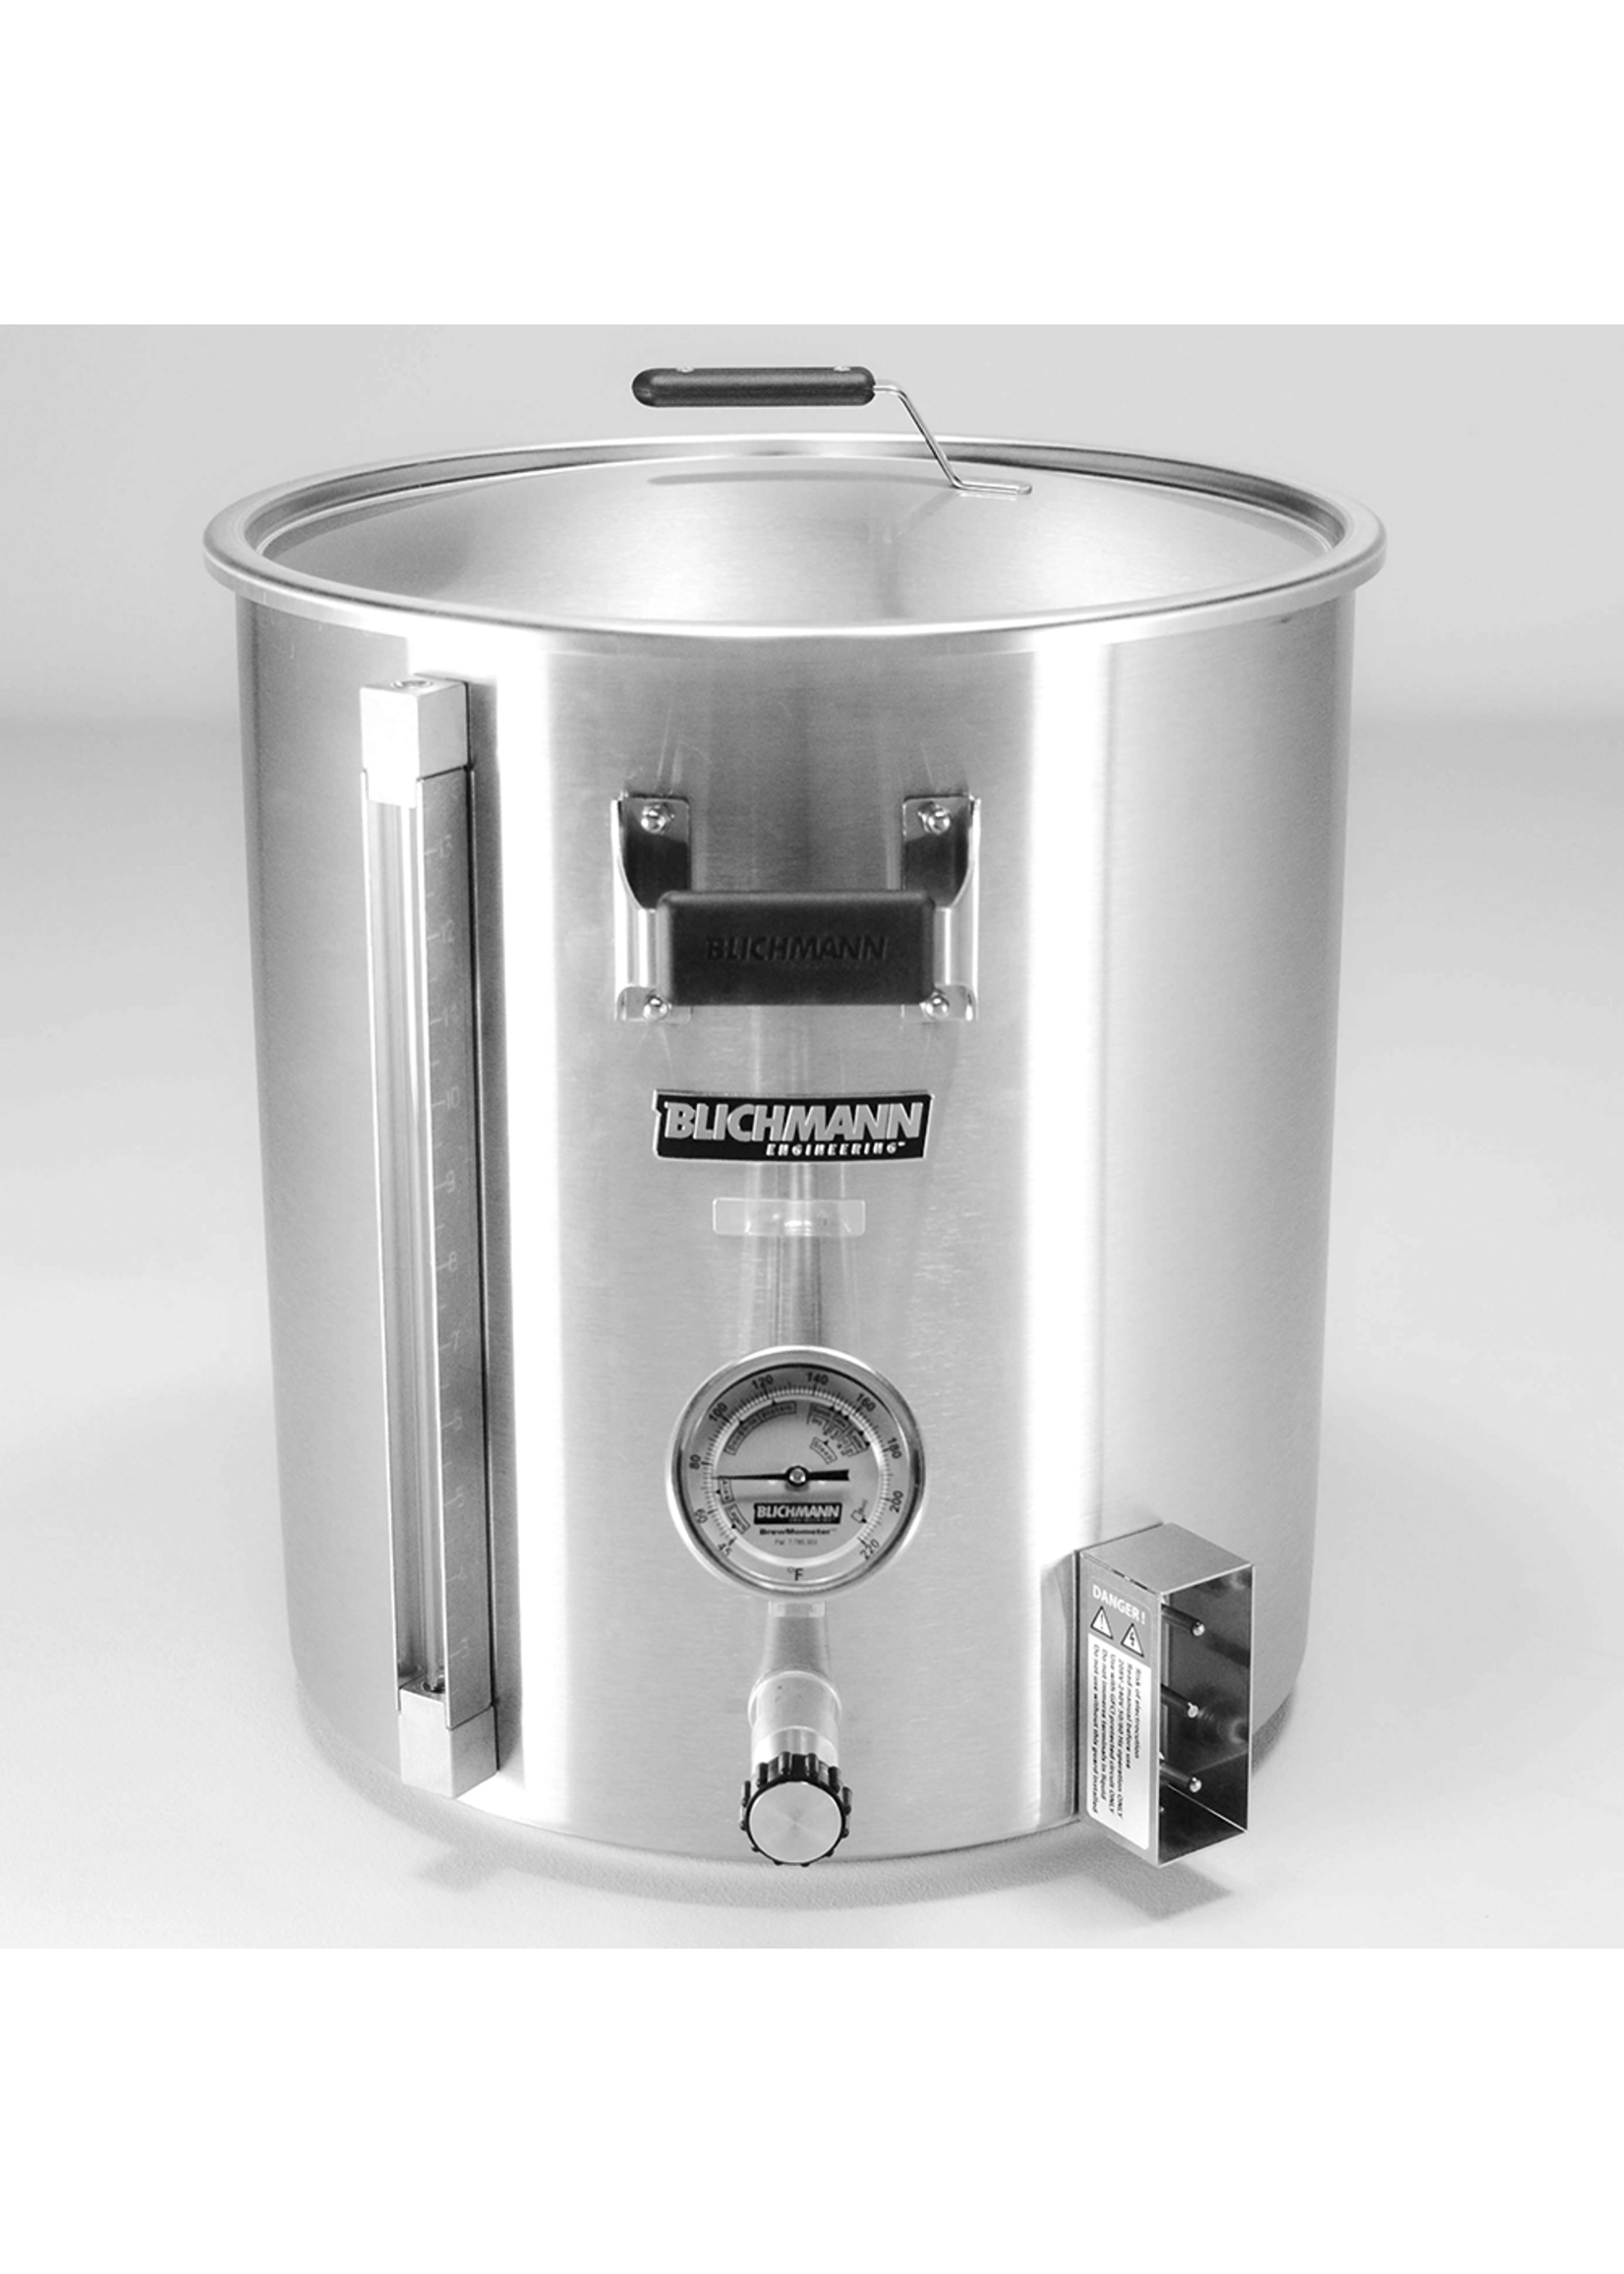 Blichmann Blichmann BoilerMaker G2 - 20 Gallon 240V Electric Brew Kettle (Celsius)